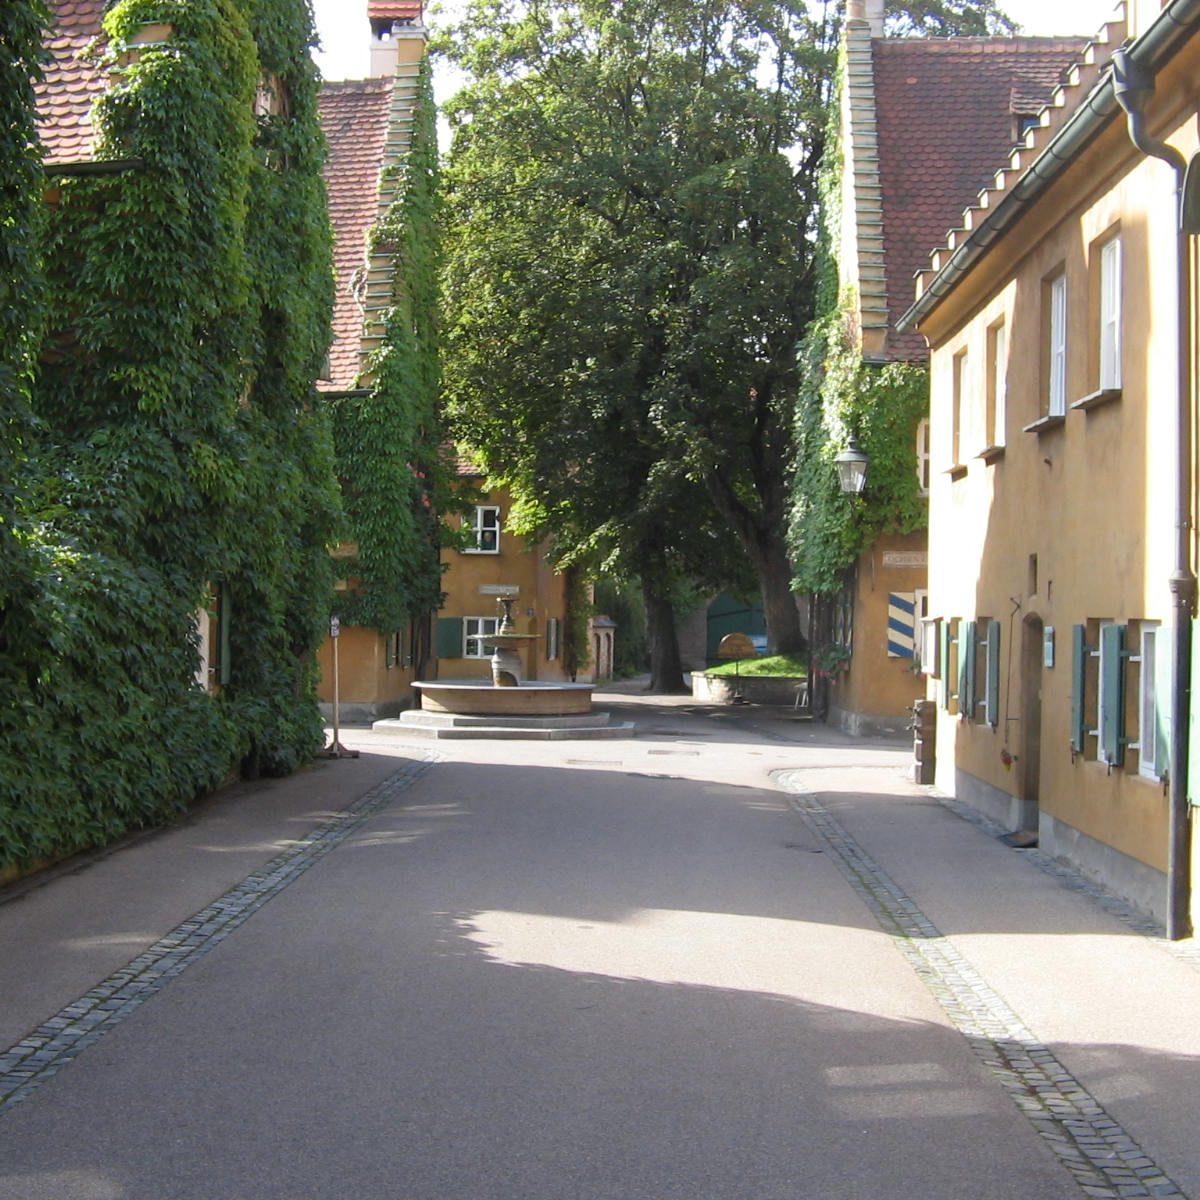 Fuggerei in Augsburg - Energy consulting Augsburg